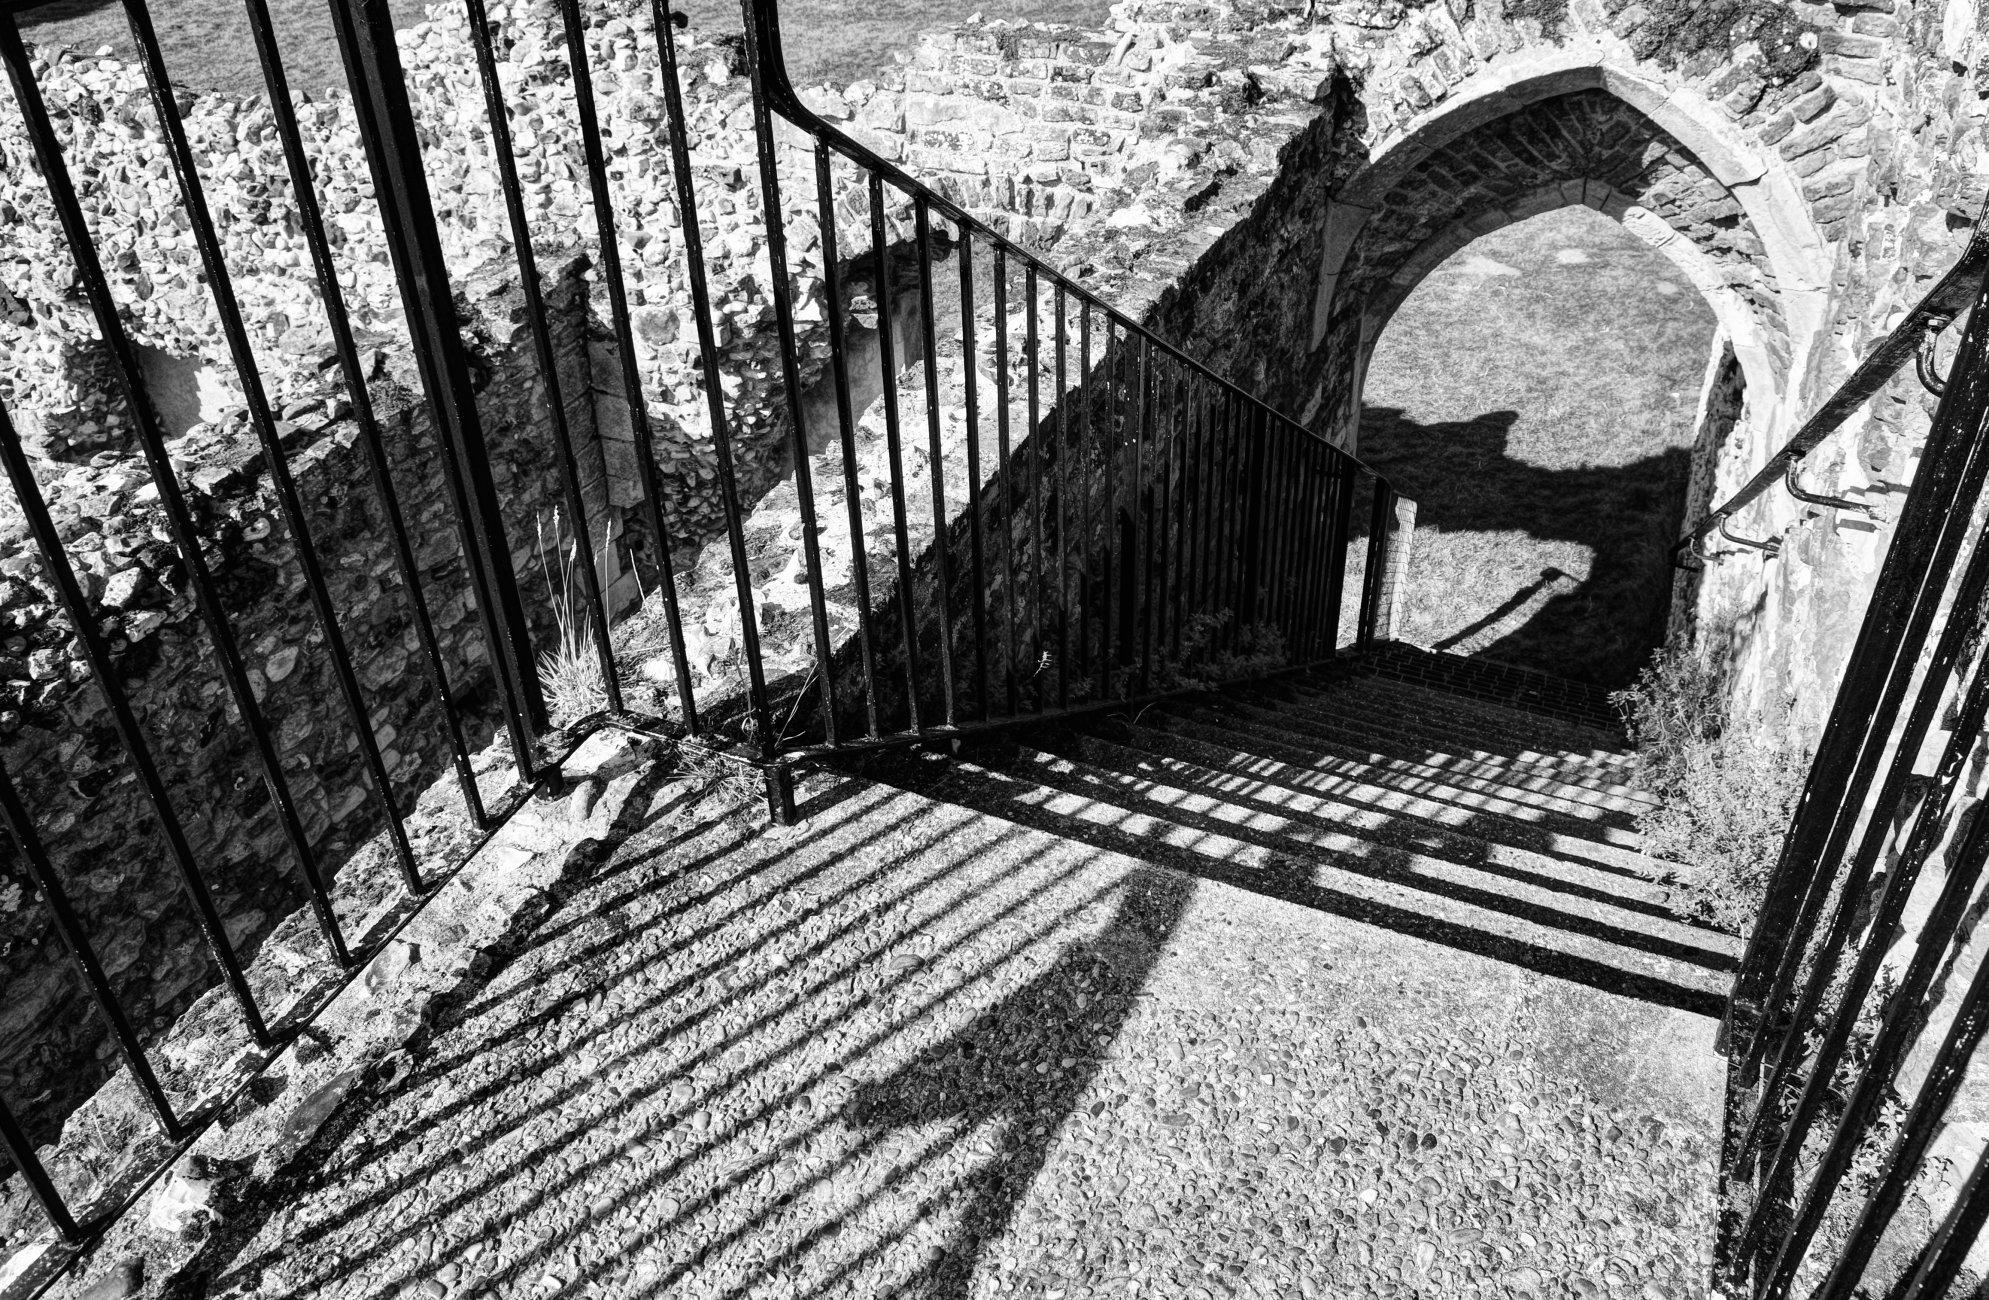 Shady steps